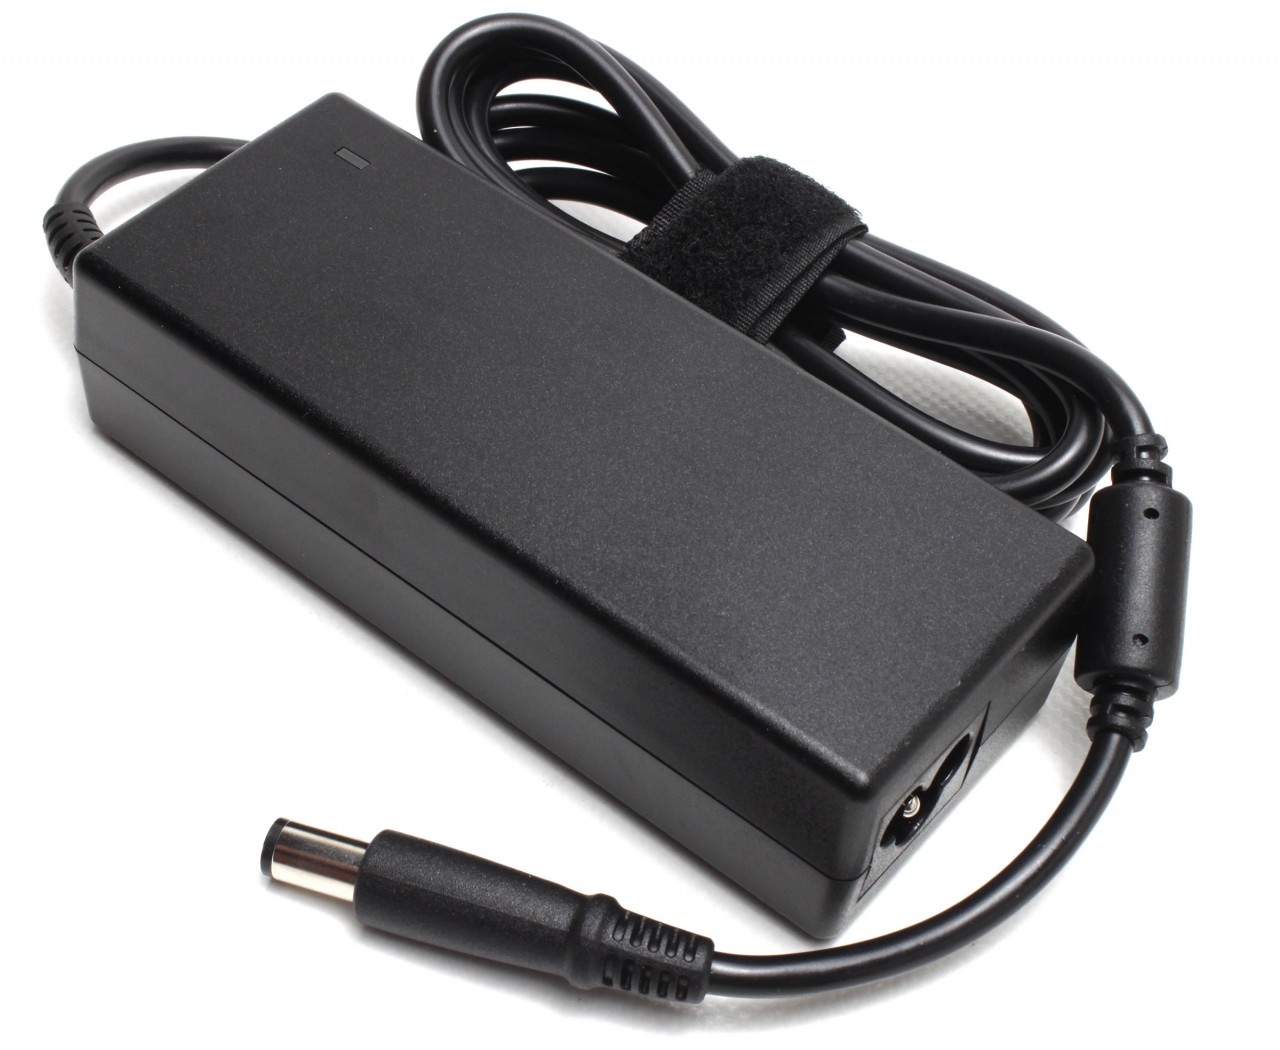 Incarcator Dell Latitude D505 VARIANTA 3 imagine powerlaptop.ro 2021